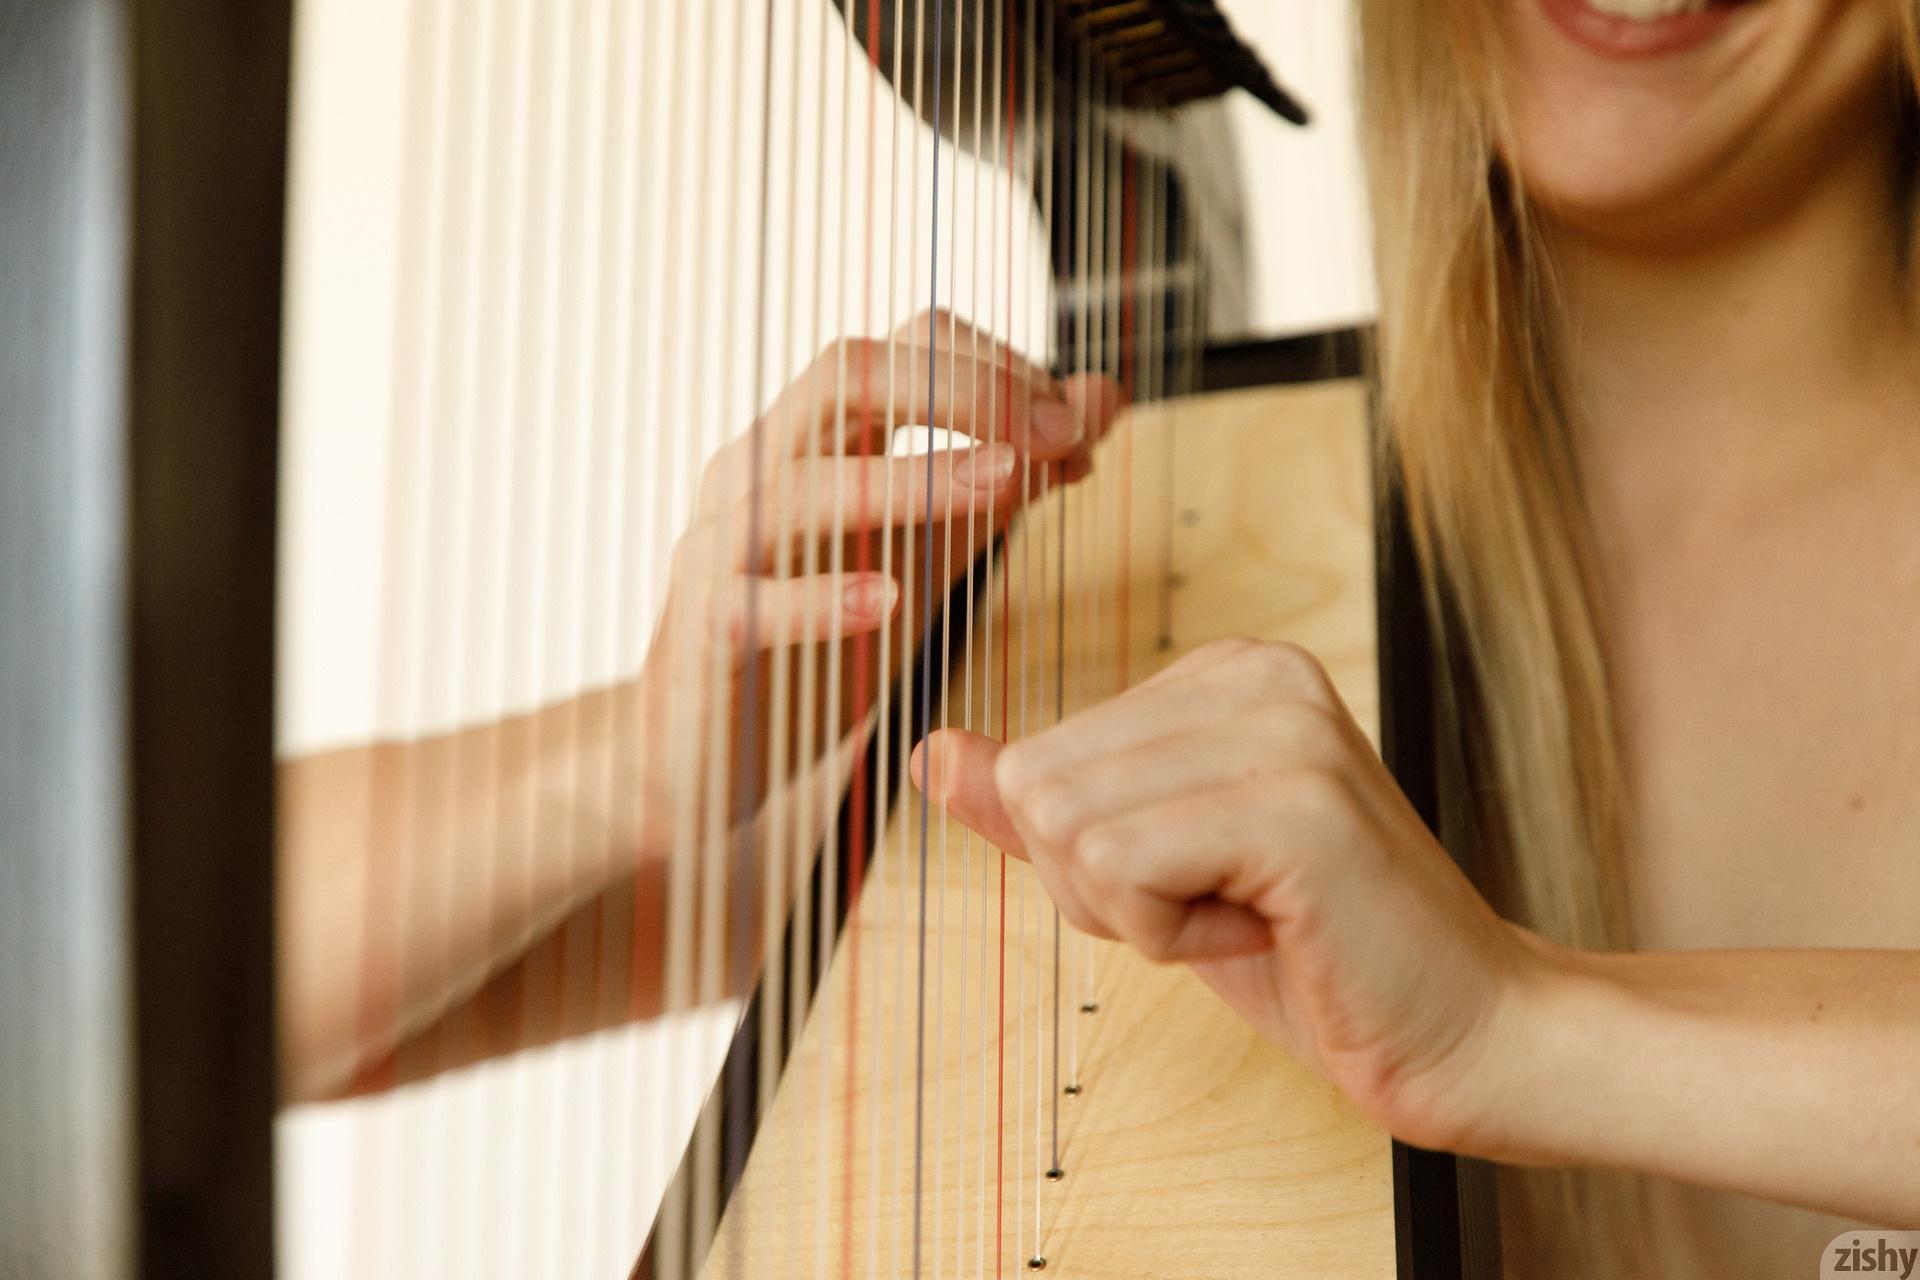 Helen Bergstrom Show Me Your Strings Zishy (23)